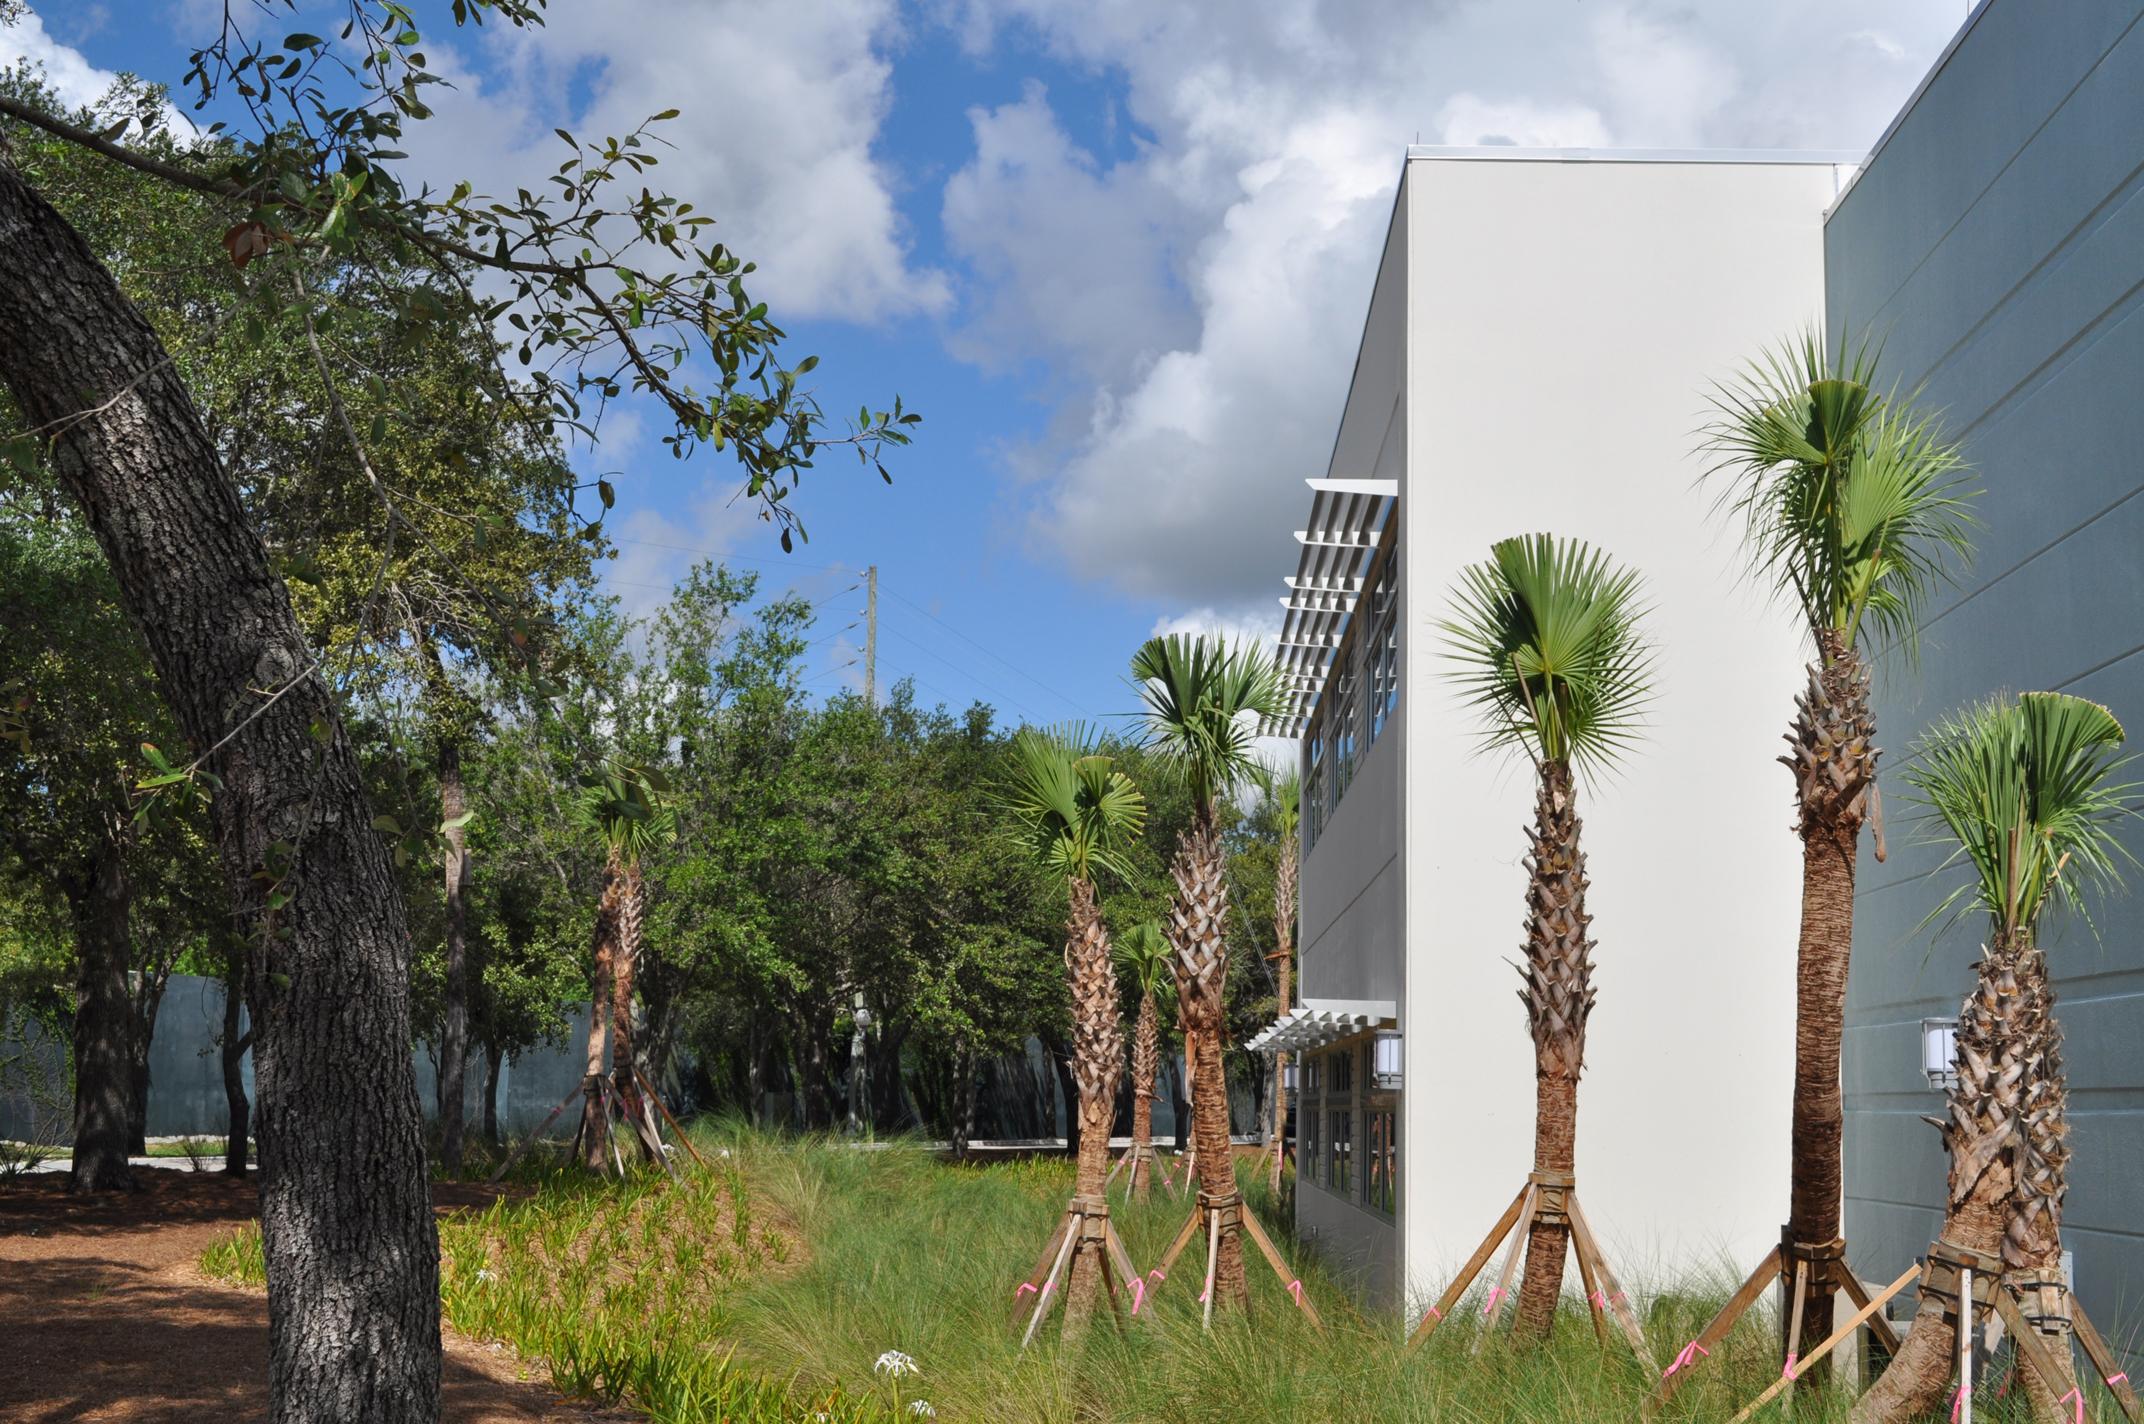 Harbor Branch Oceanographic Institute at FAU Research Laboratory II Bio Swale Native Florida Grasses.JPG